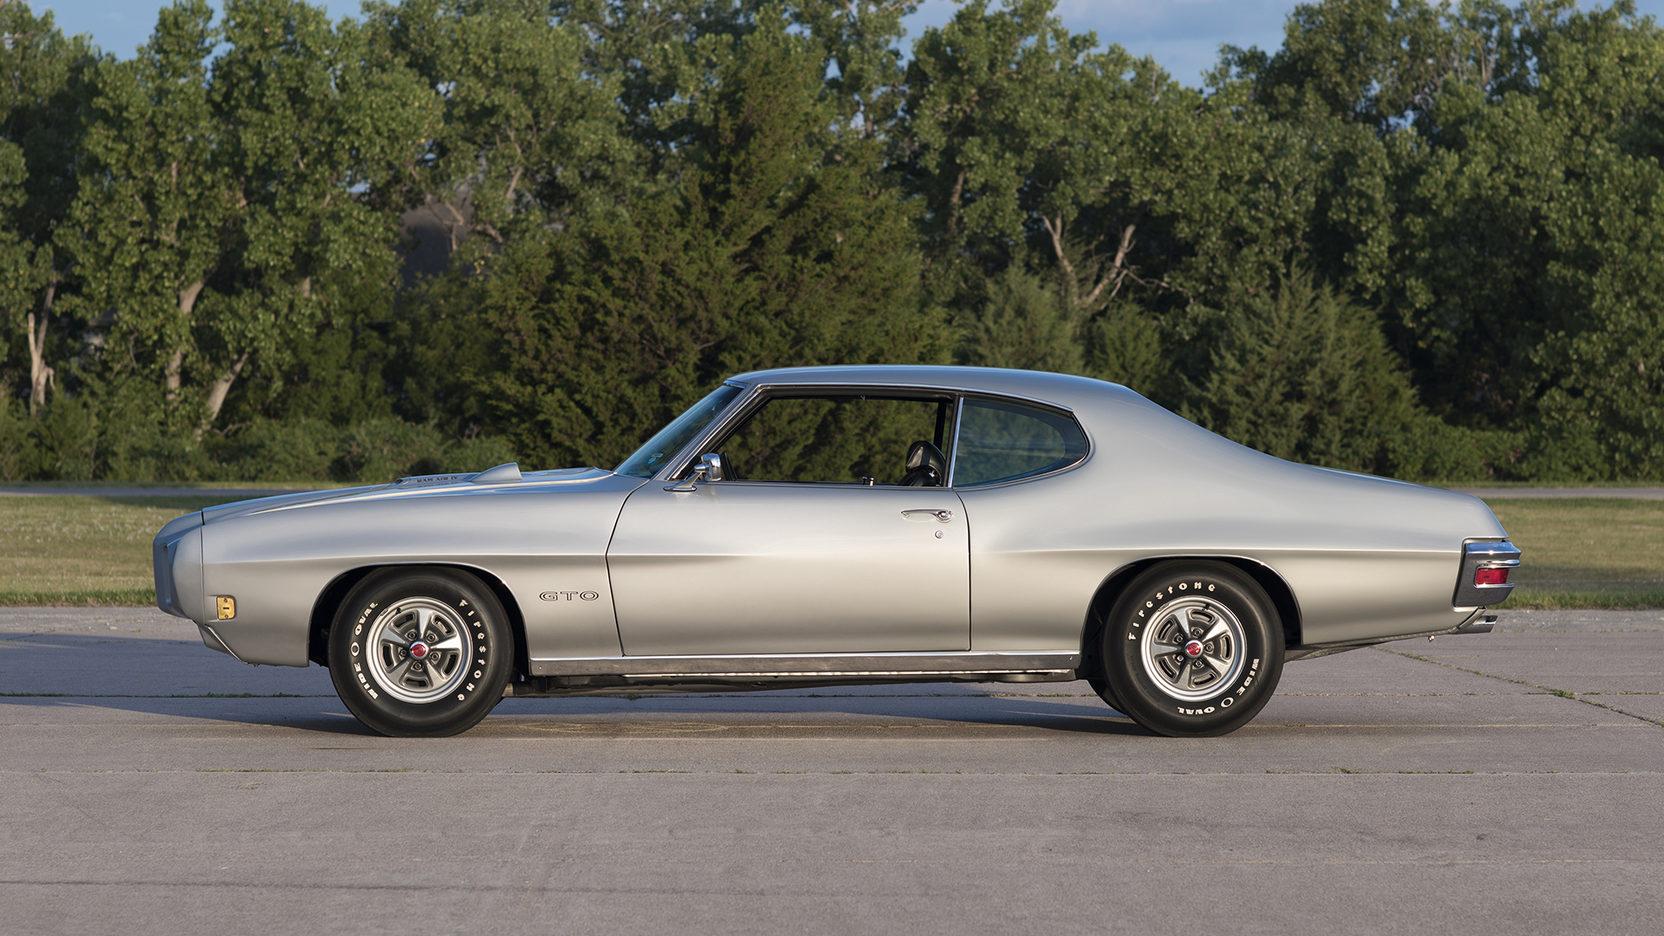 1970 Pontiac GTO Ram Air IV driver profile side